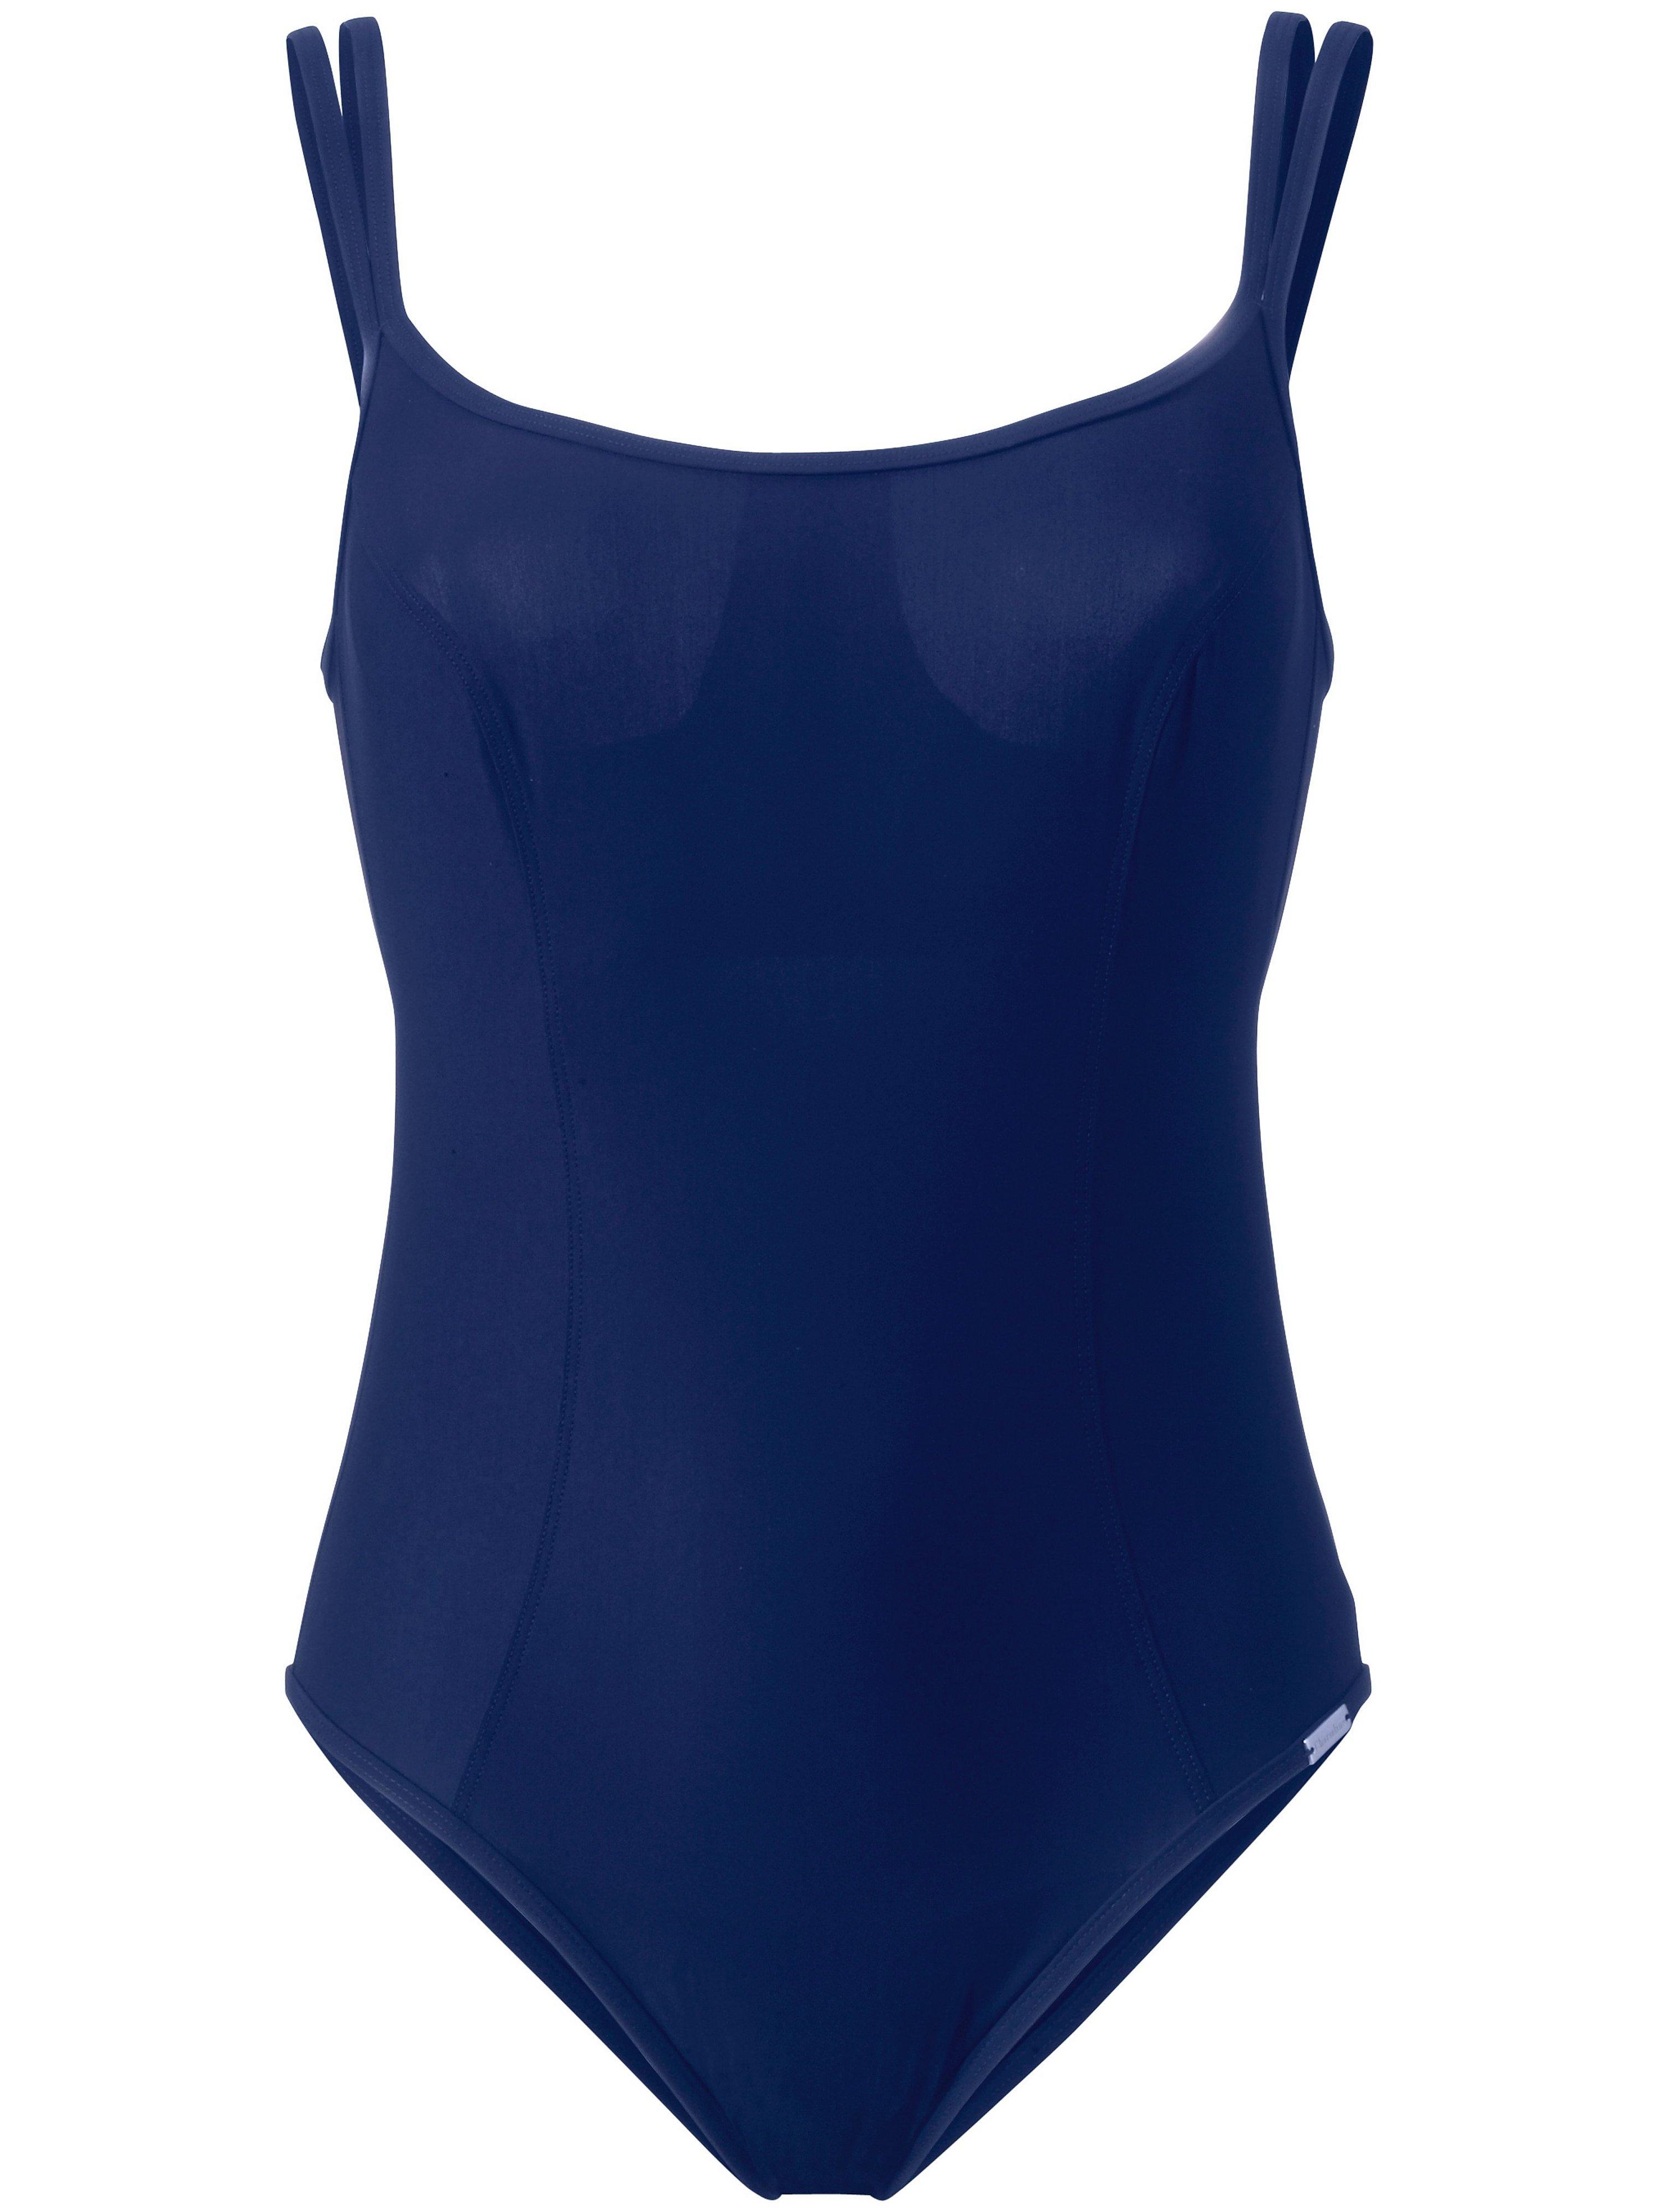 Badpak Van Charmline blauw